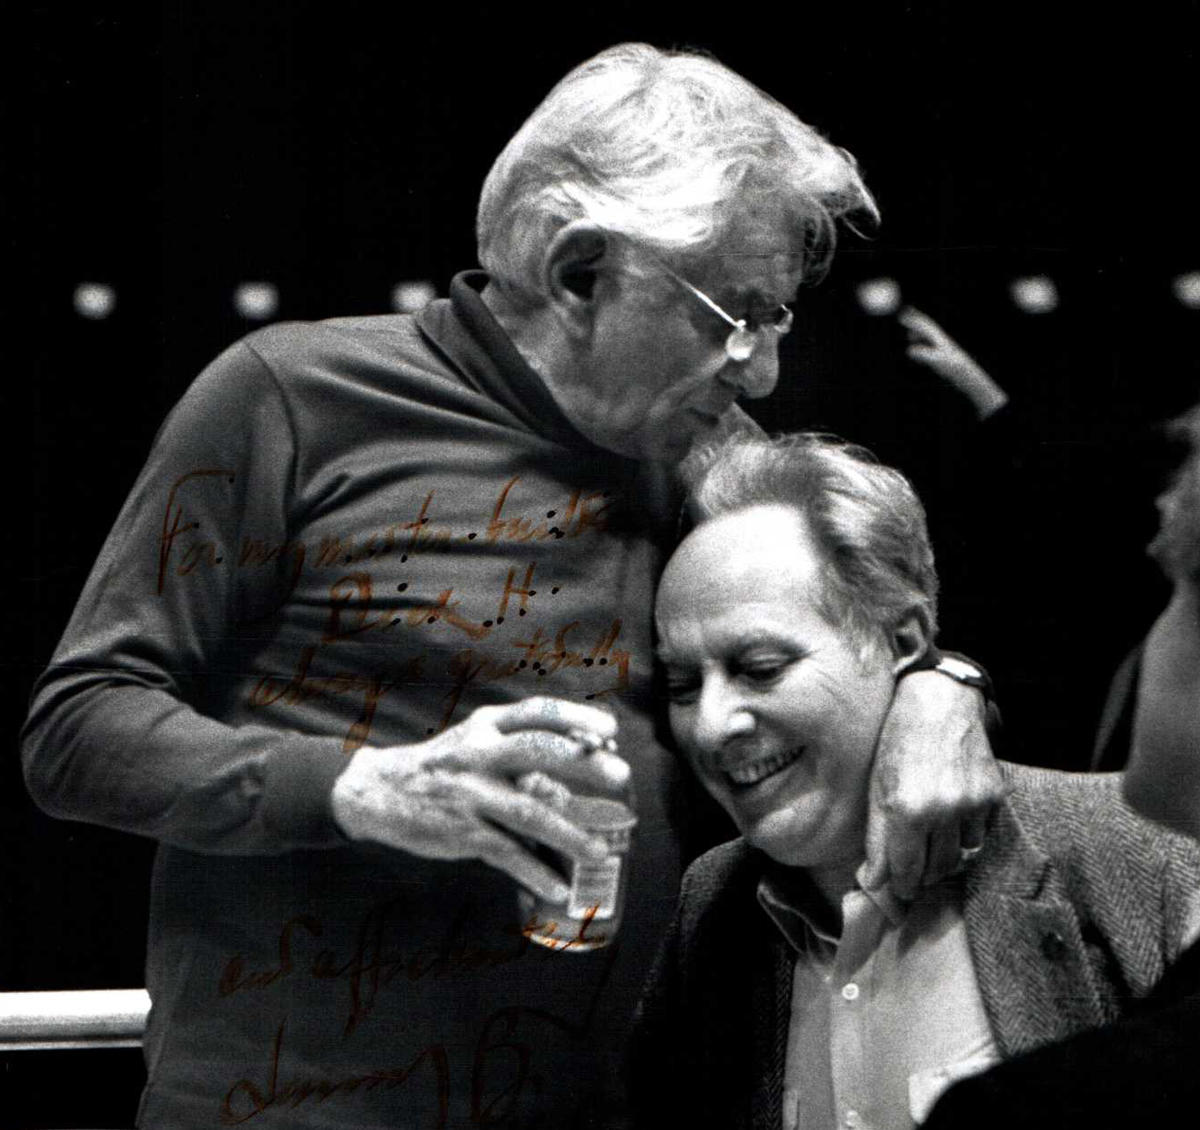 Leonard Bernstein Bernstein - The New York Philharmonic Orchestra New York Philharmonic Jeremiah Symphony - The Age Of Anxiety - I Hate Music! - La Bonne Cuisine